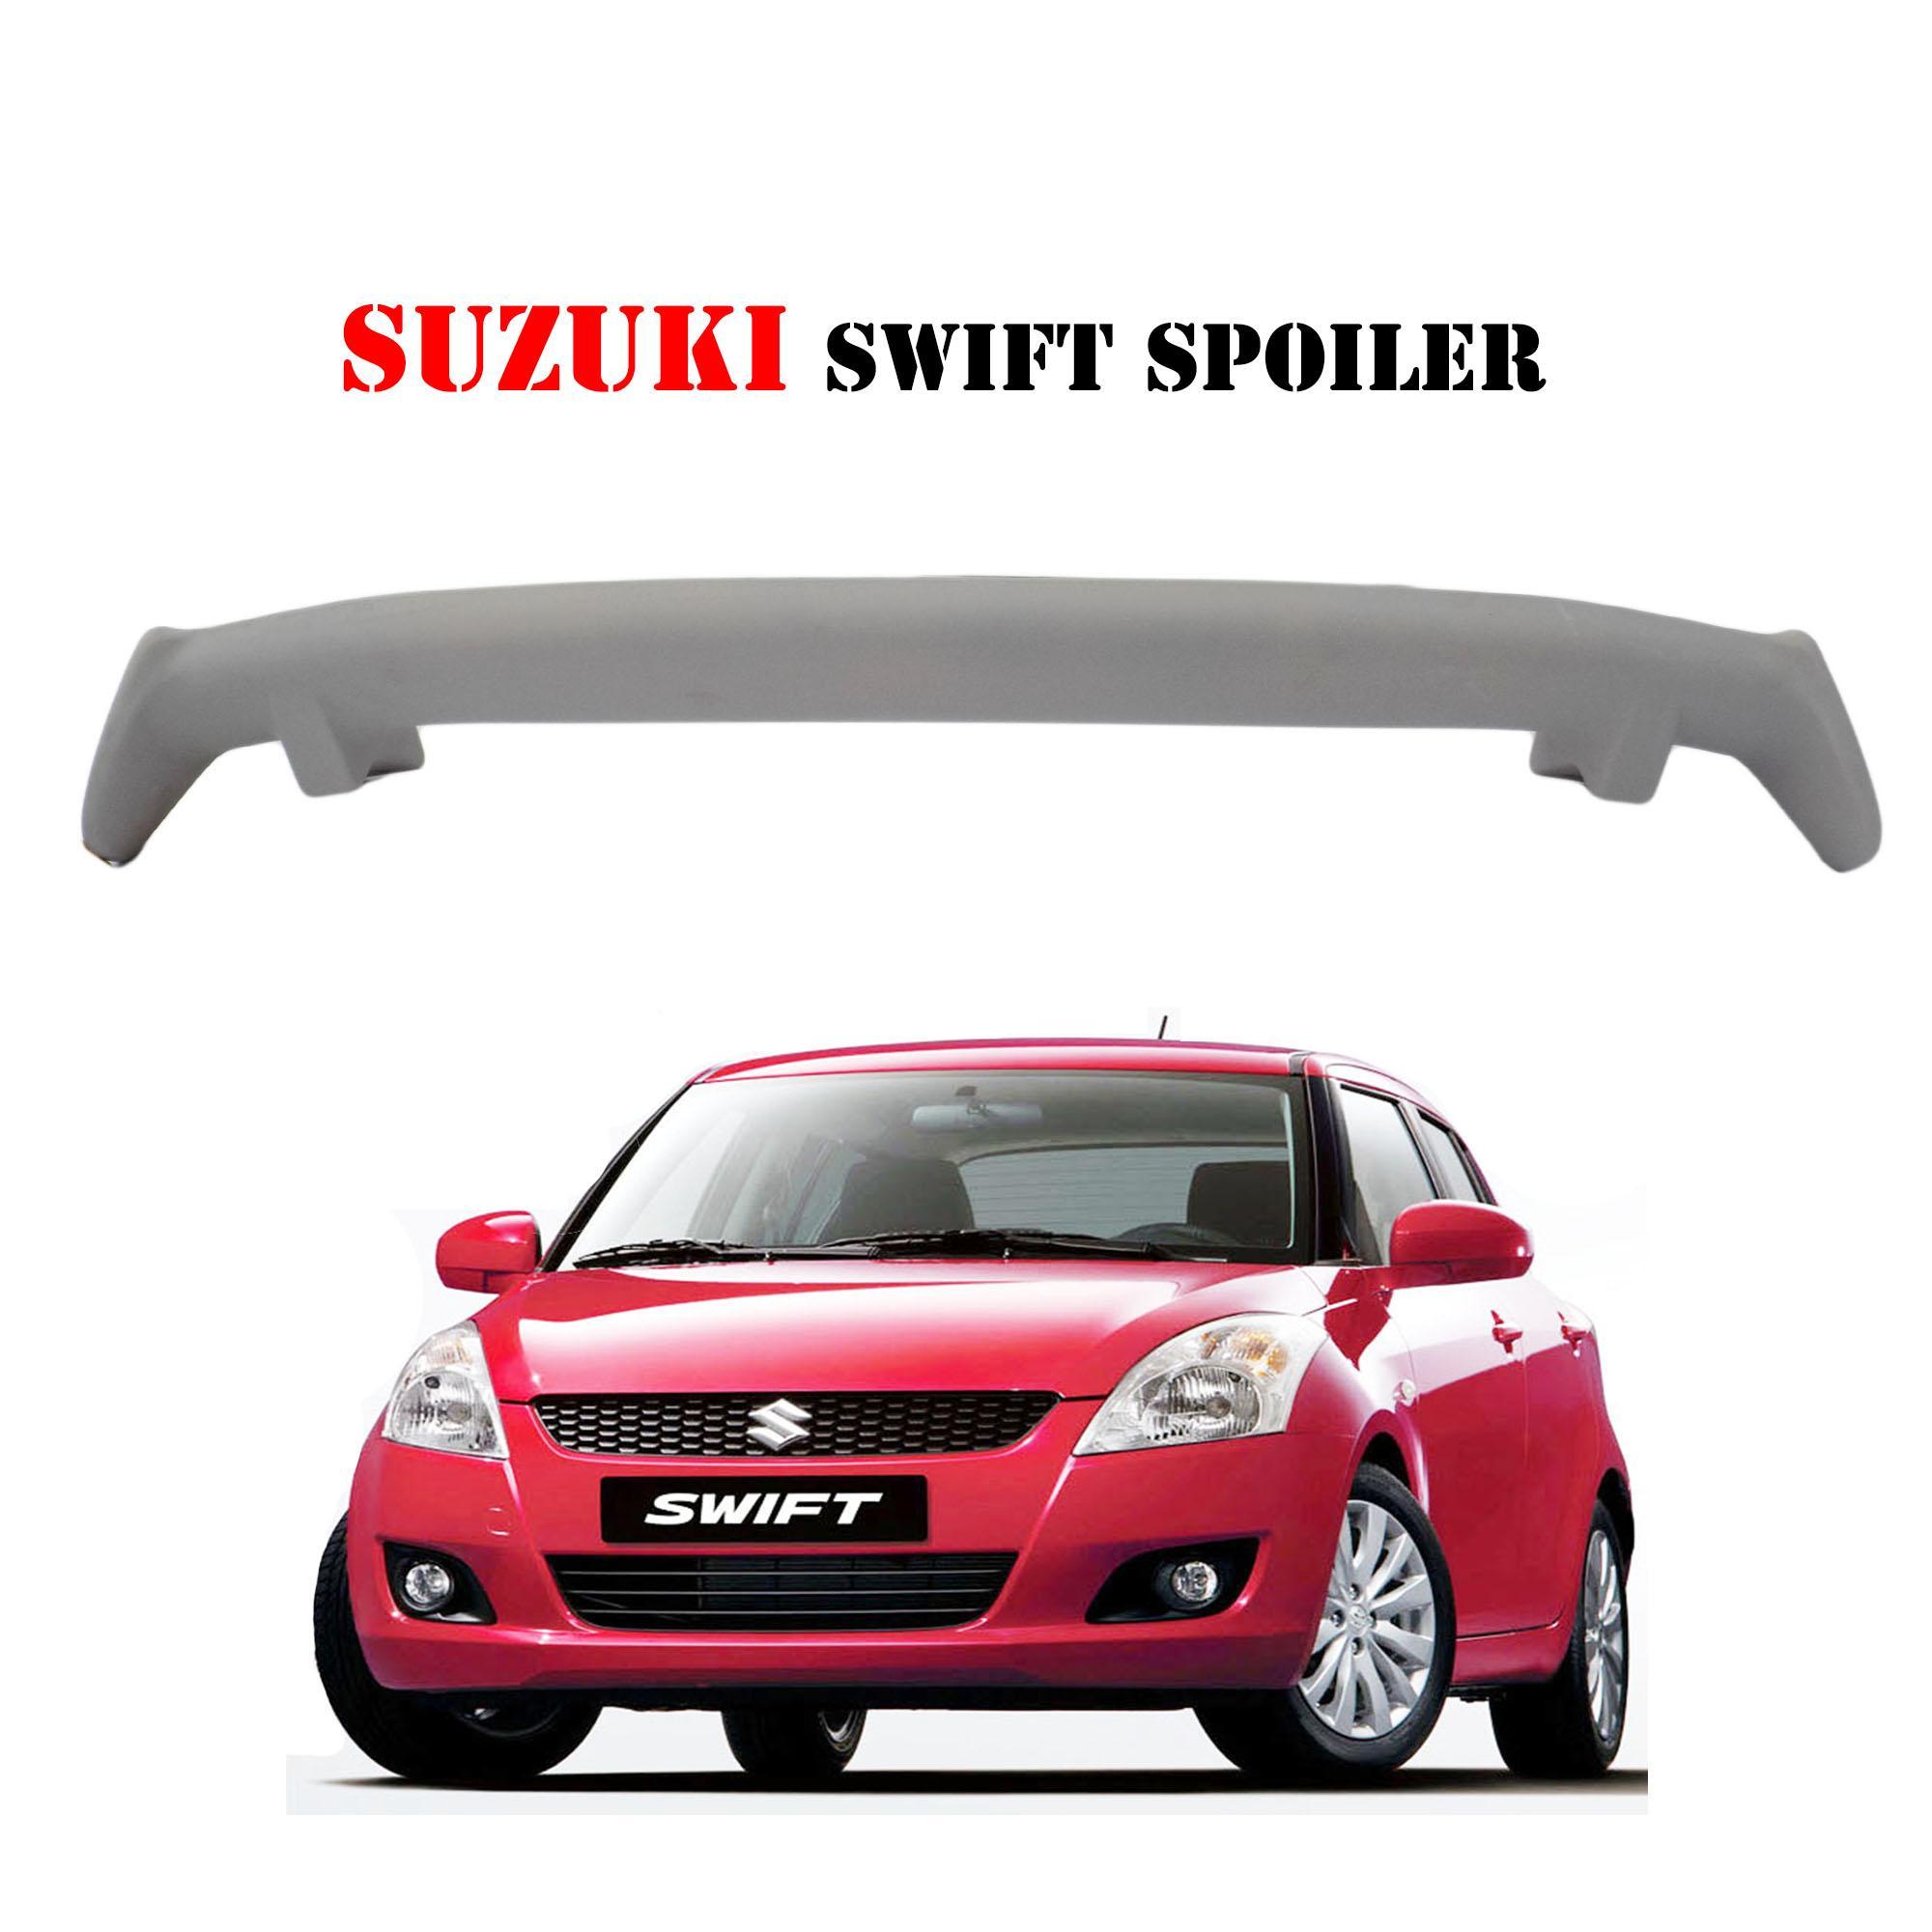 Suzuki Swift 2012 Spoiler In ABS